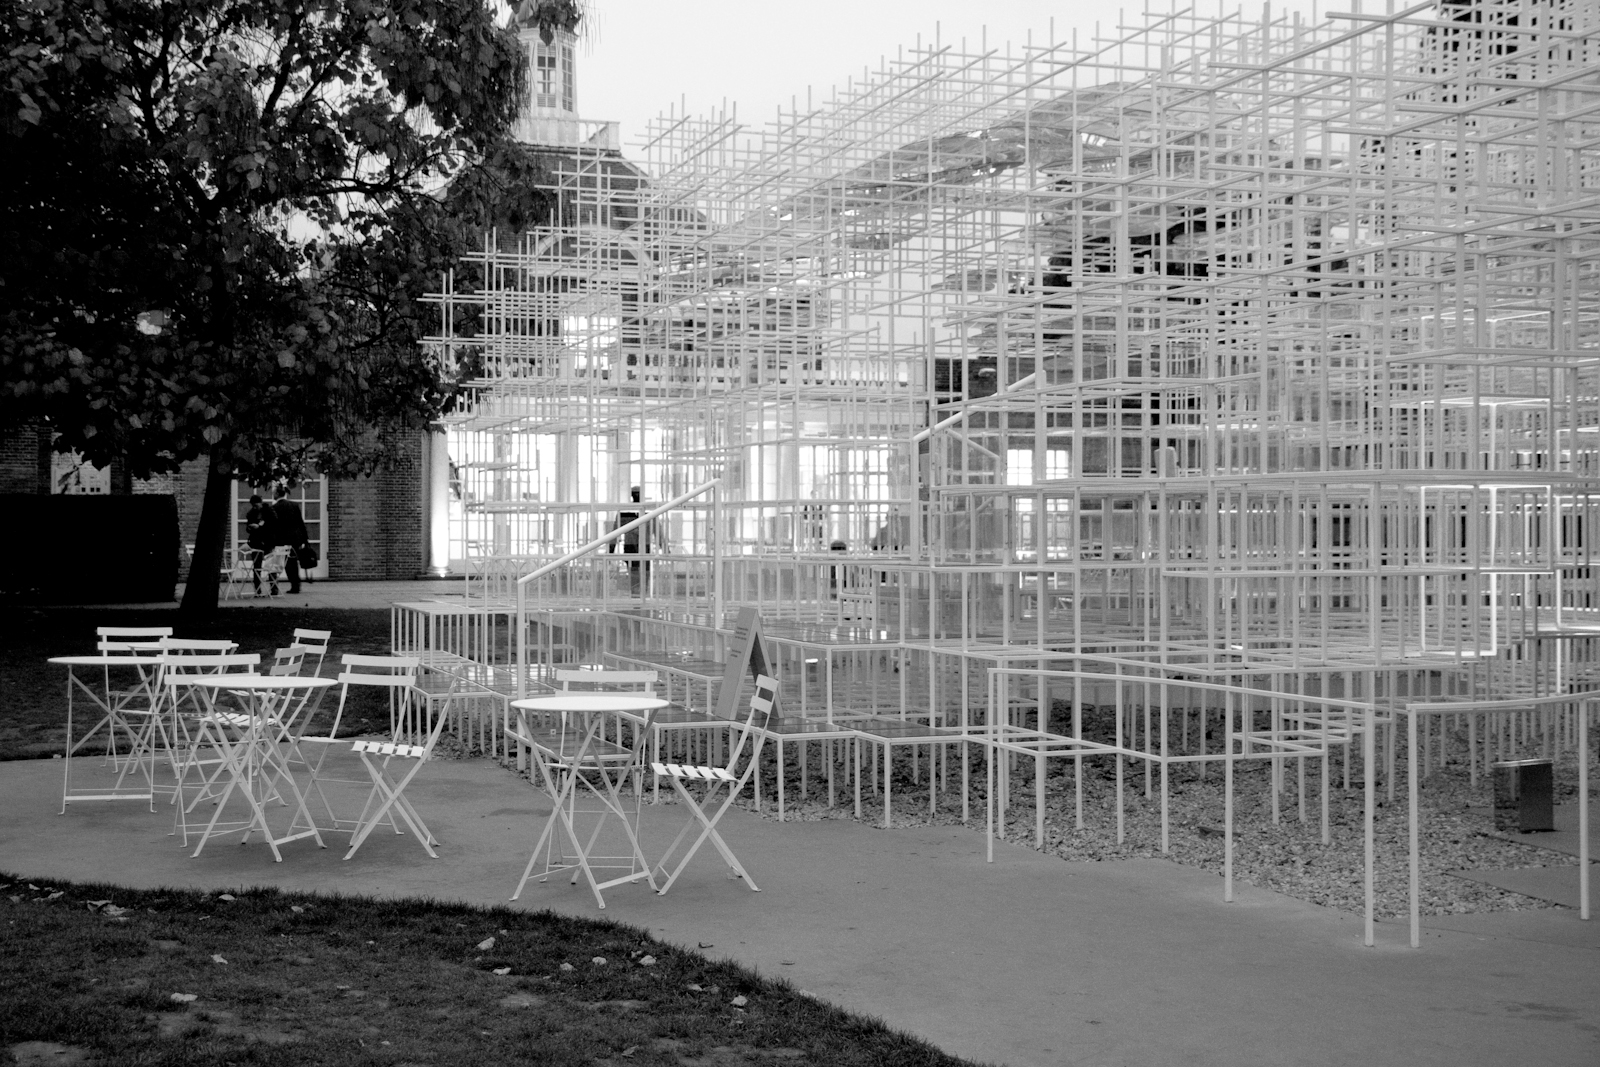 B&W - Serpentine Gallery Pavilion 2013Designed by Sou Fujimoto